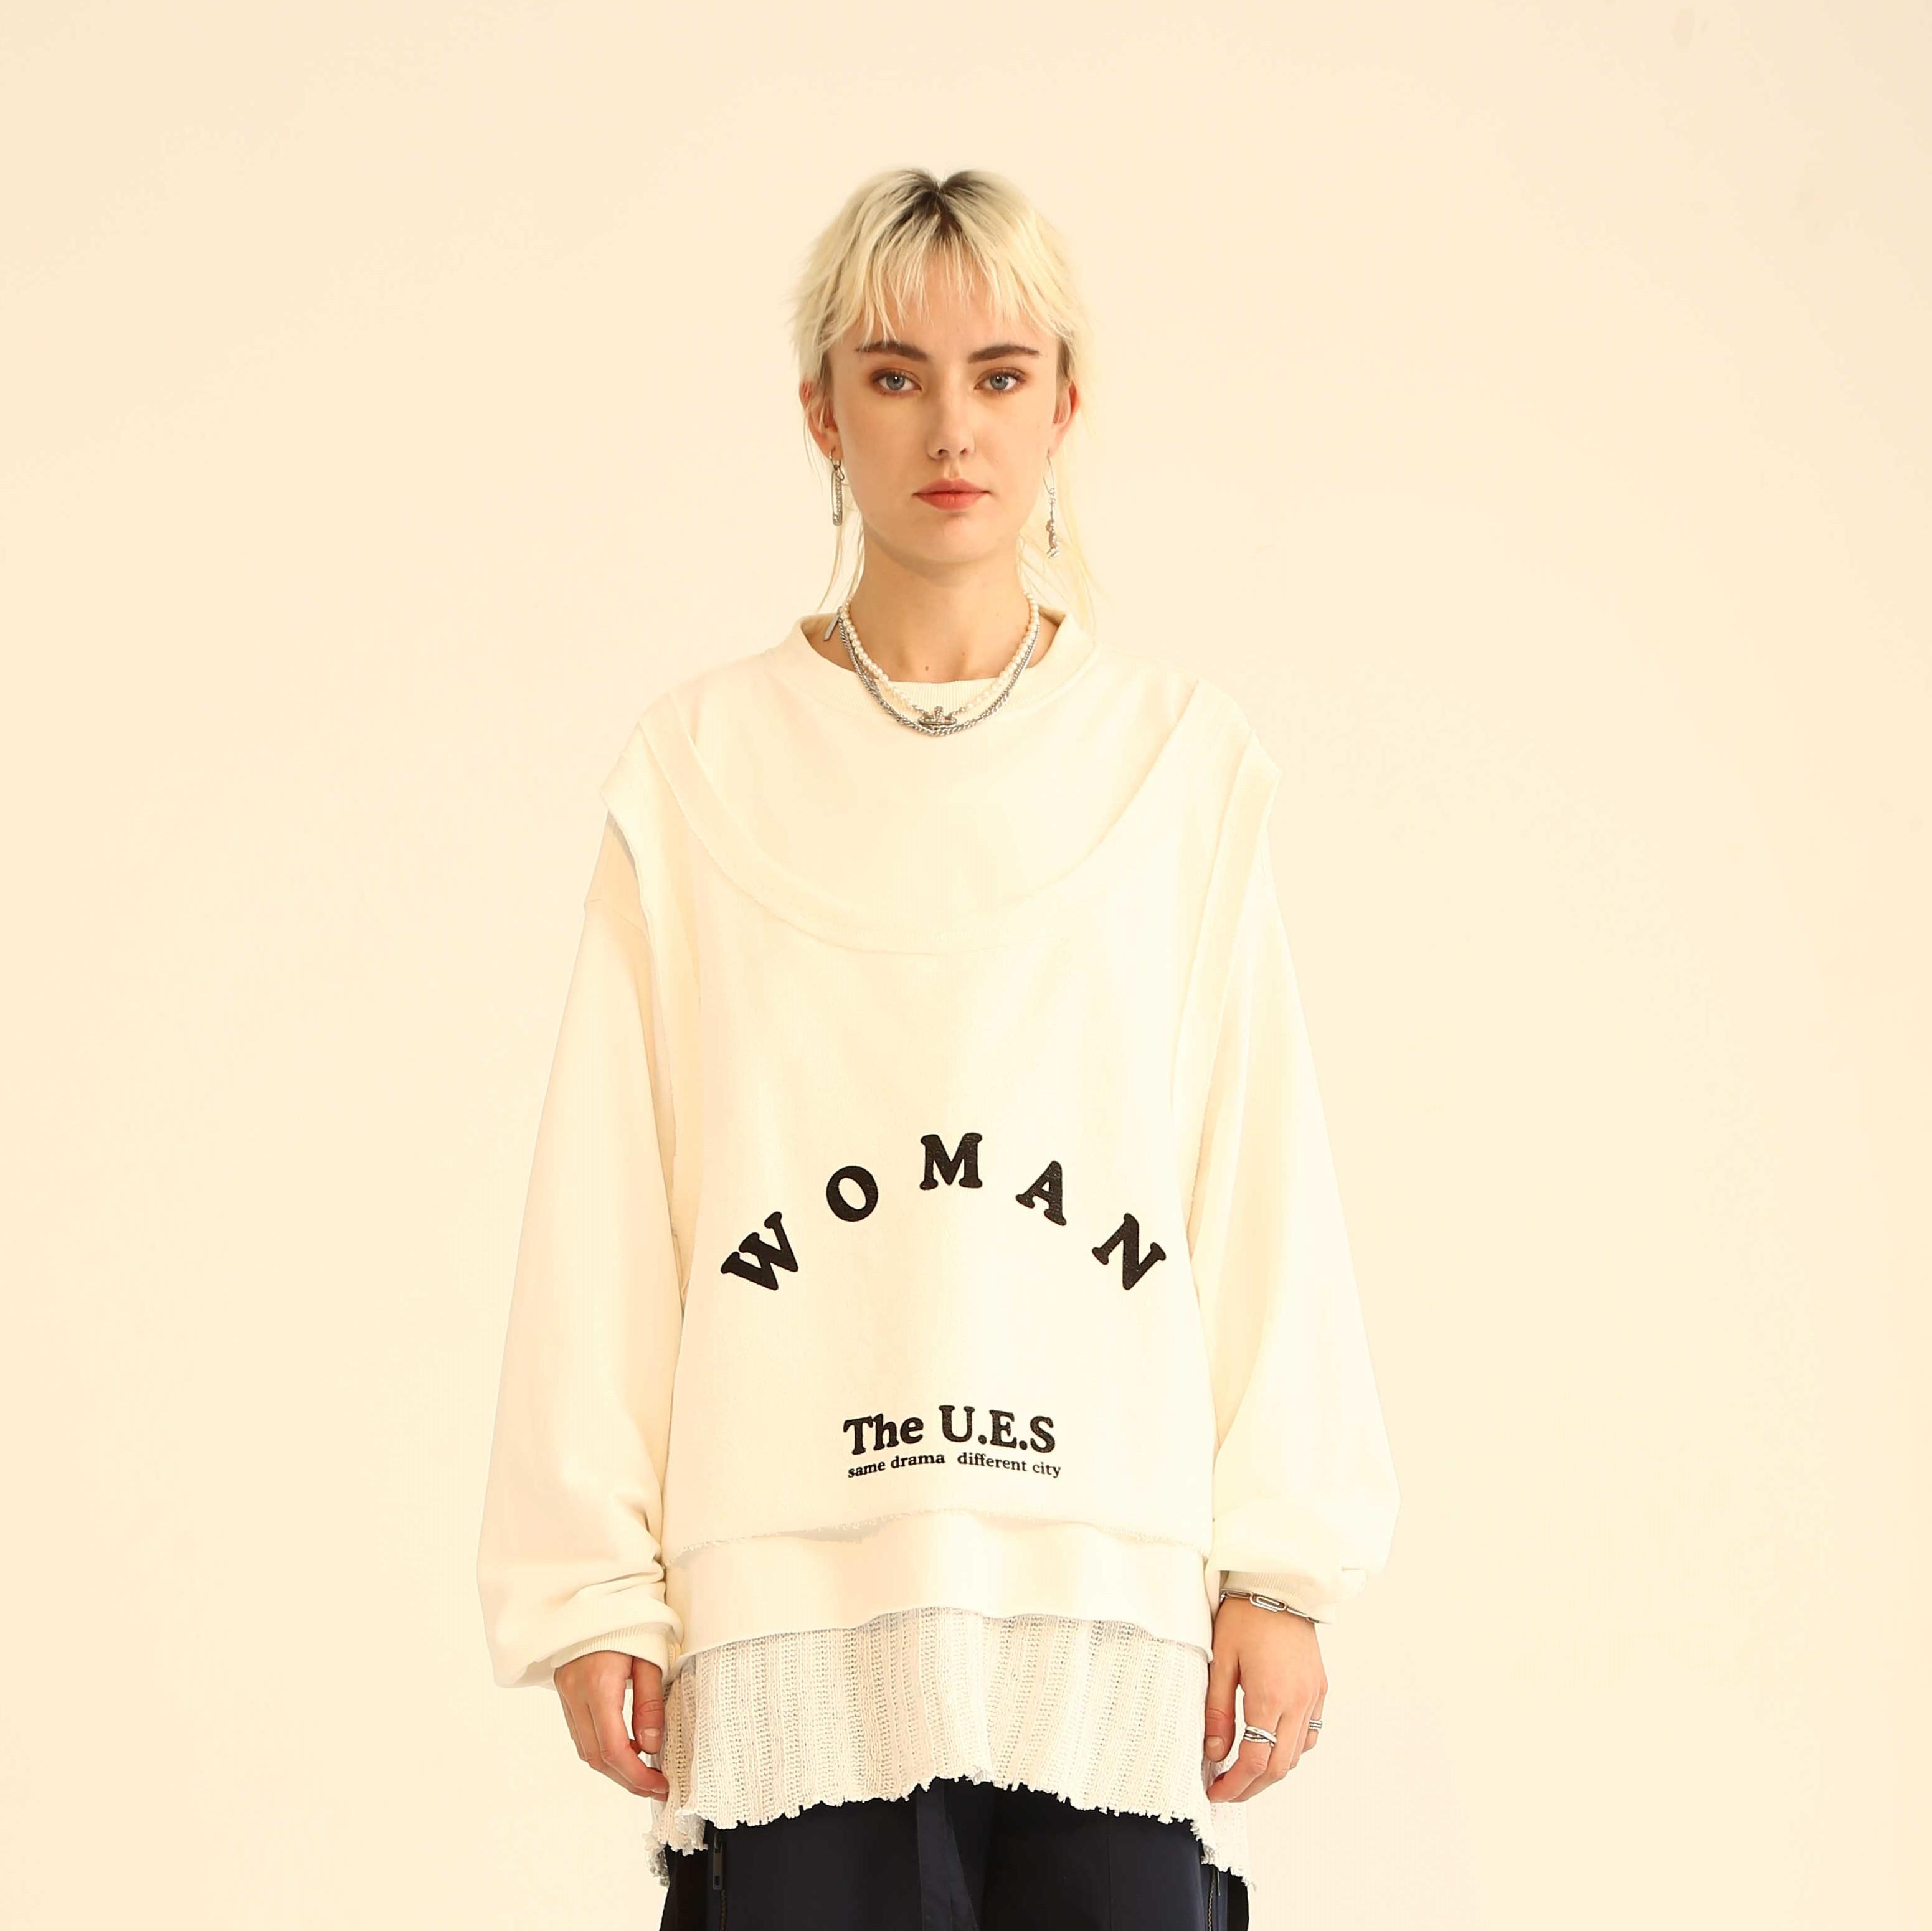 Upper East Siders嘻哈高街假两件背心T恤 原创WOMEN字母印花卫衣